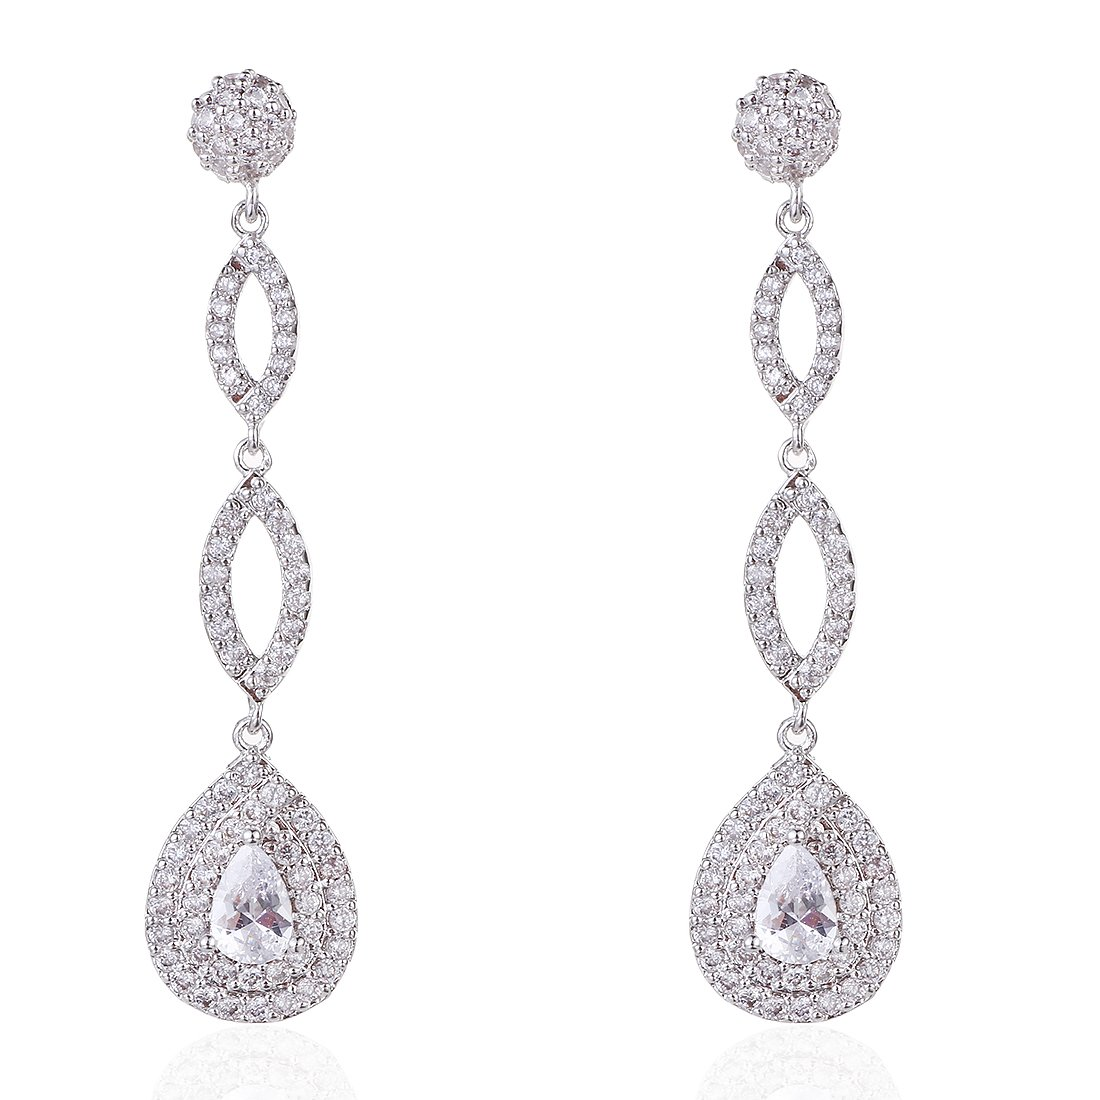 Wordless Love Full Pave Cubic Zirconia Teardrop Bridal Long Earrings White Weeding Jewelry by Wordless Love (Image #1)